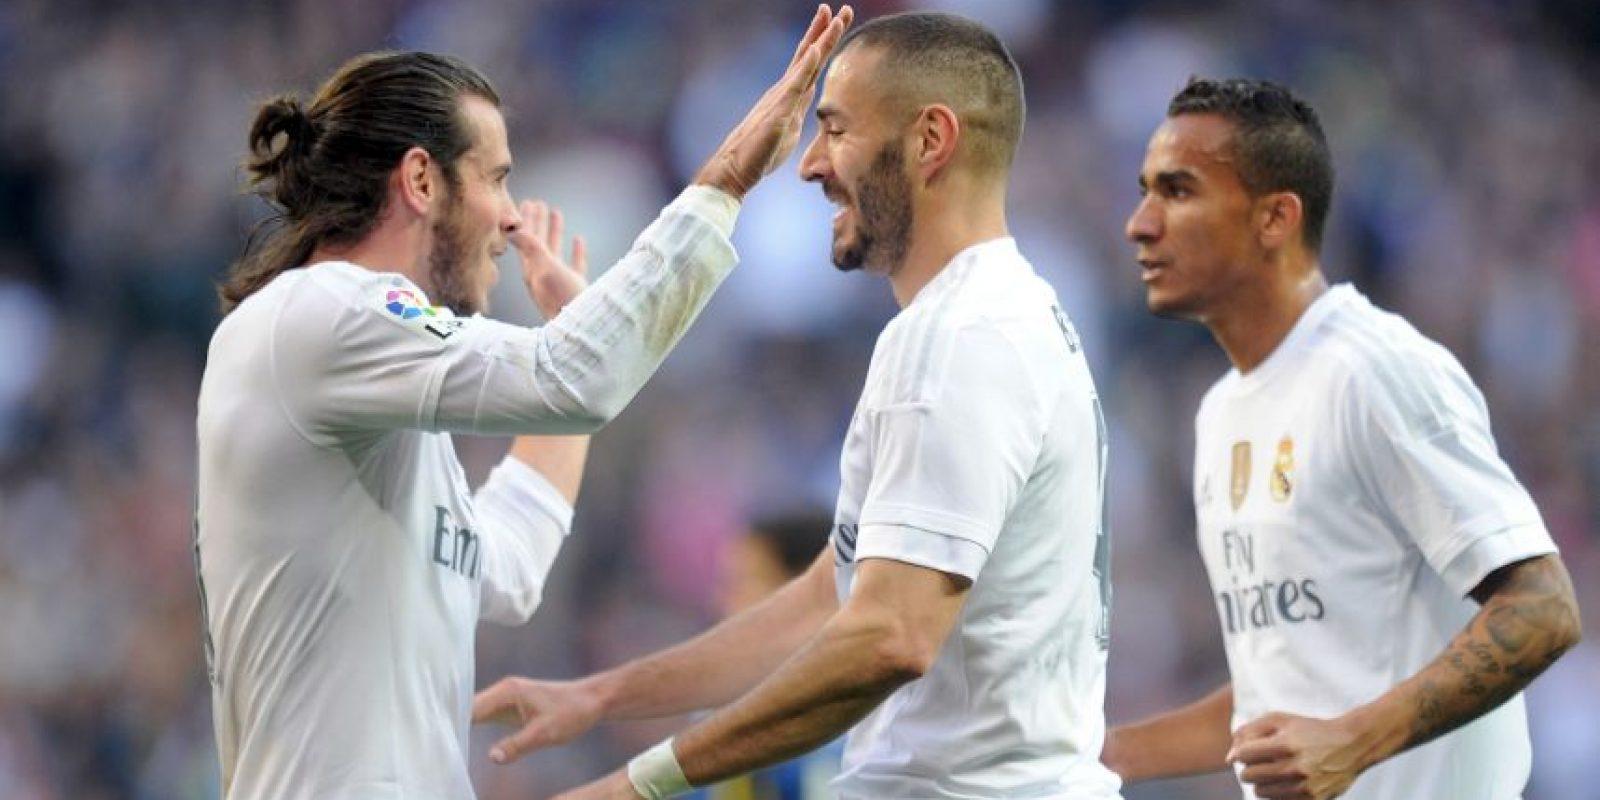 Real Madrid llega a la última jornada con el boleto a octavos de final en la bolsa Foto:Getty Images